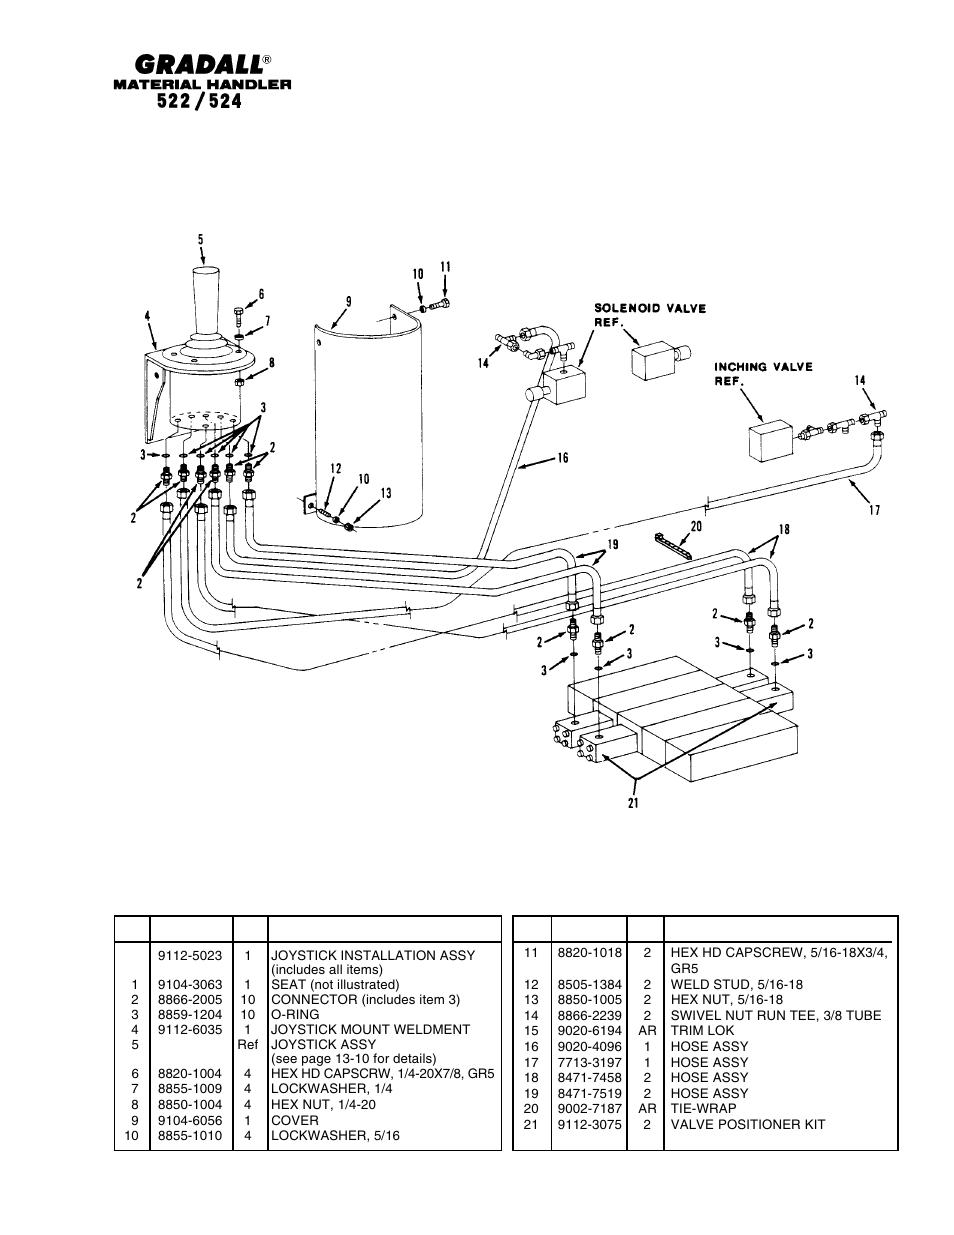 Jlg Ignition Switch Wiring Diagram Auto Electrical Liebherr Key Gradall 02 Dodge Ram